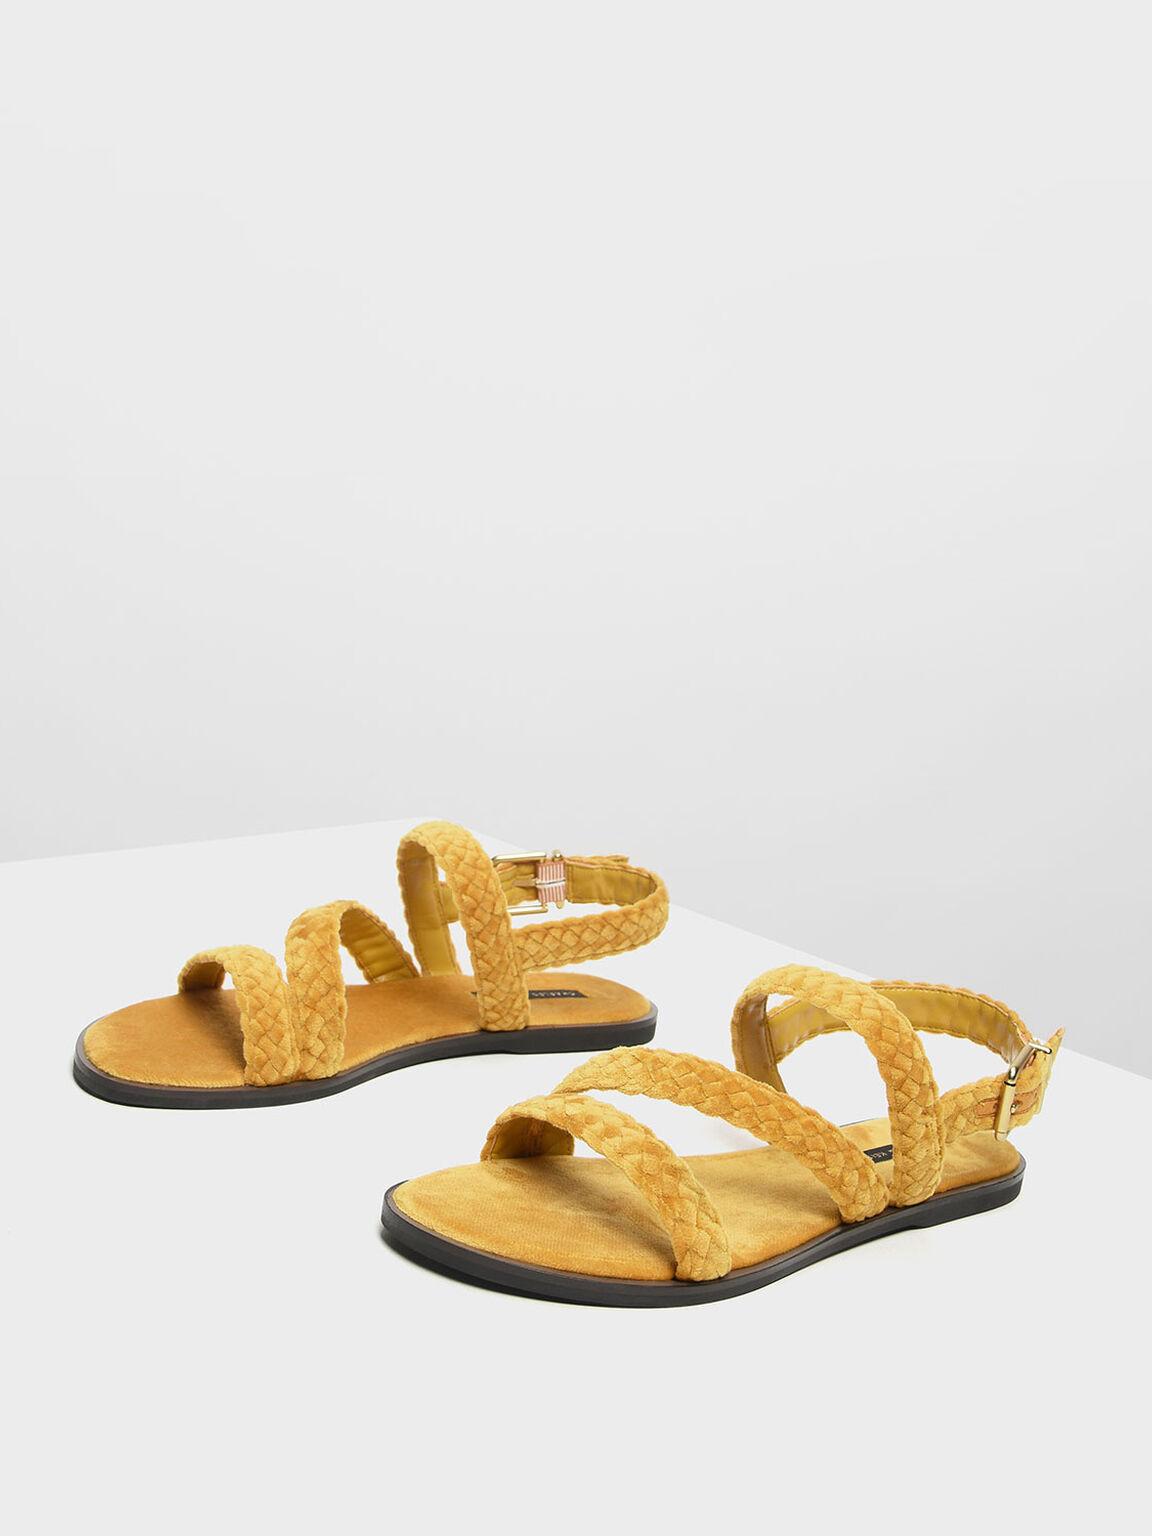 Braided Asymmetrical Sandals, Mustard, hi-res